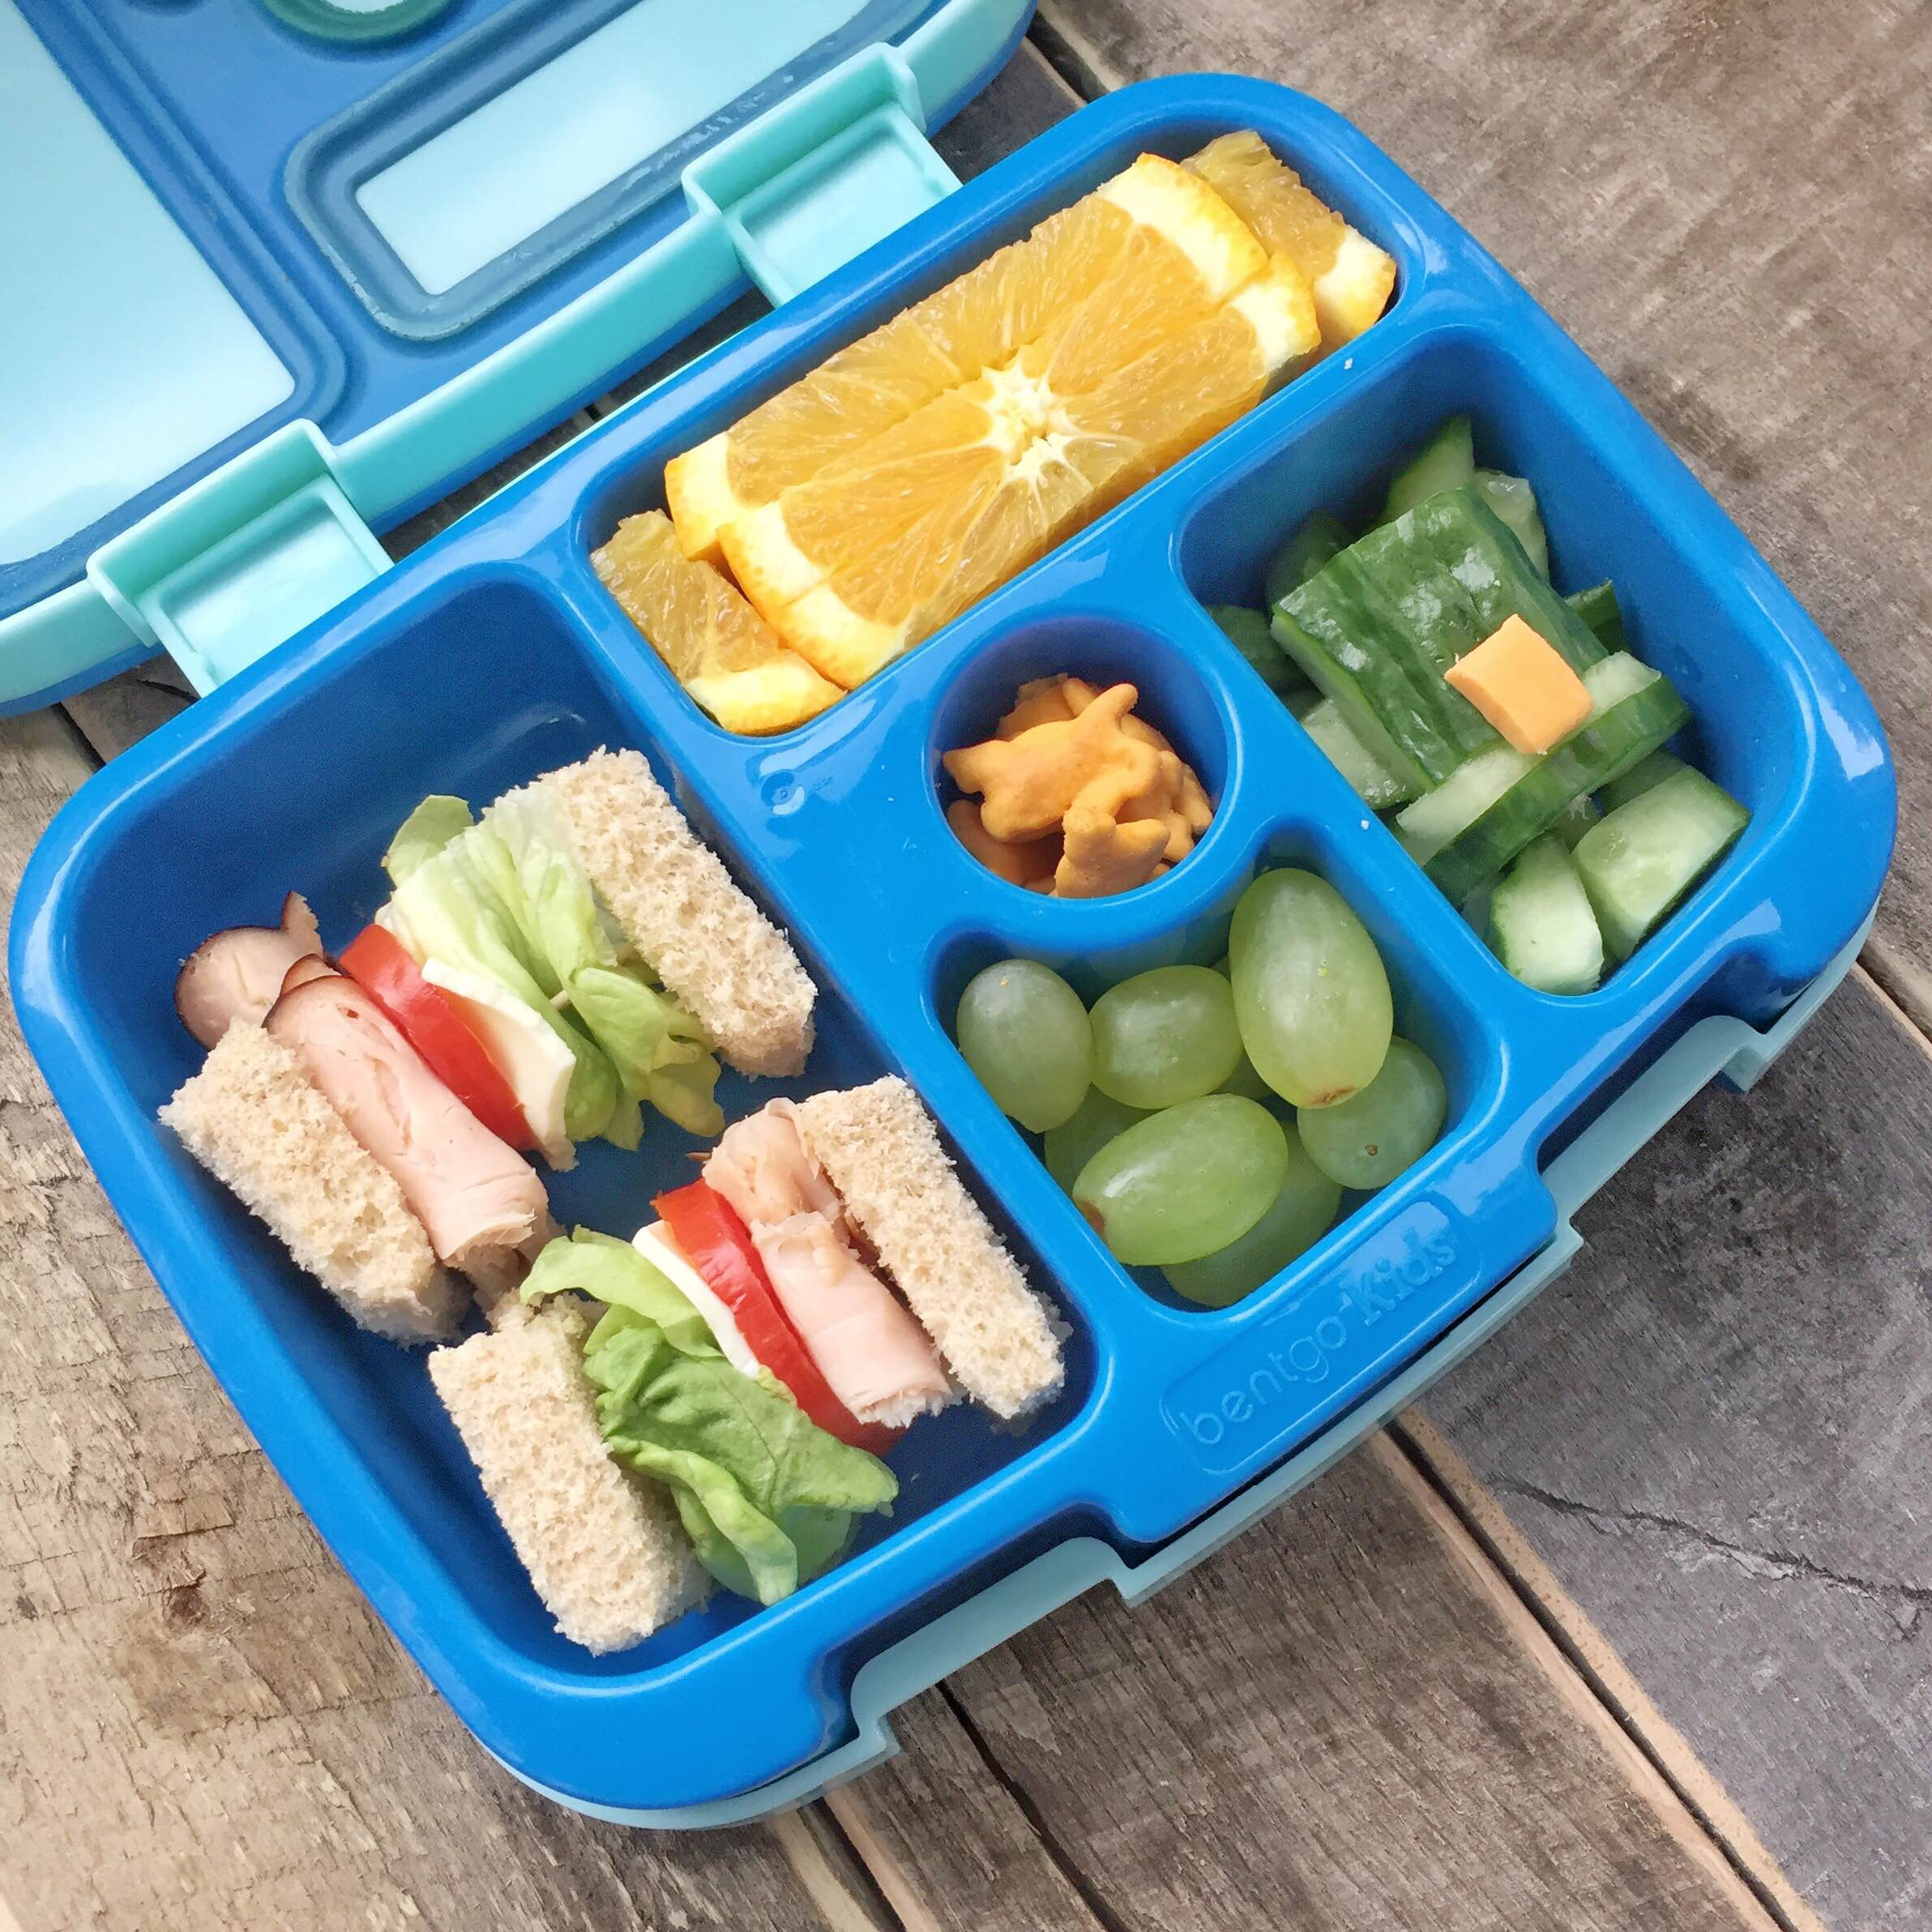 St. Patrick's Day bento lunch | St. Patrick's Day lunchbox ideas | Leprechaun lunchbox! GinaKirk.com @ginaekirk